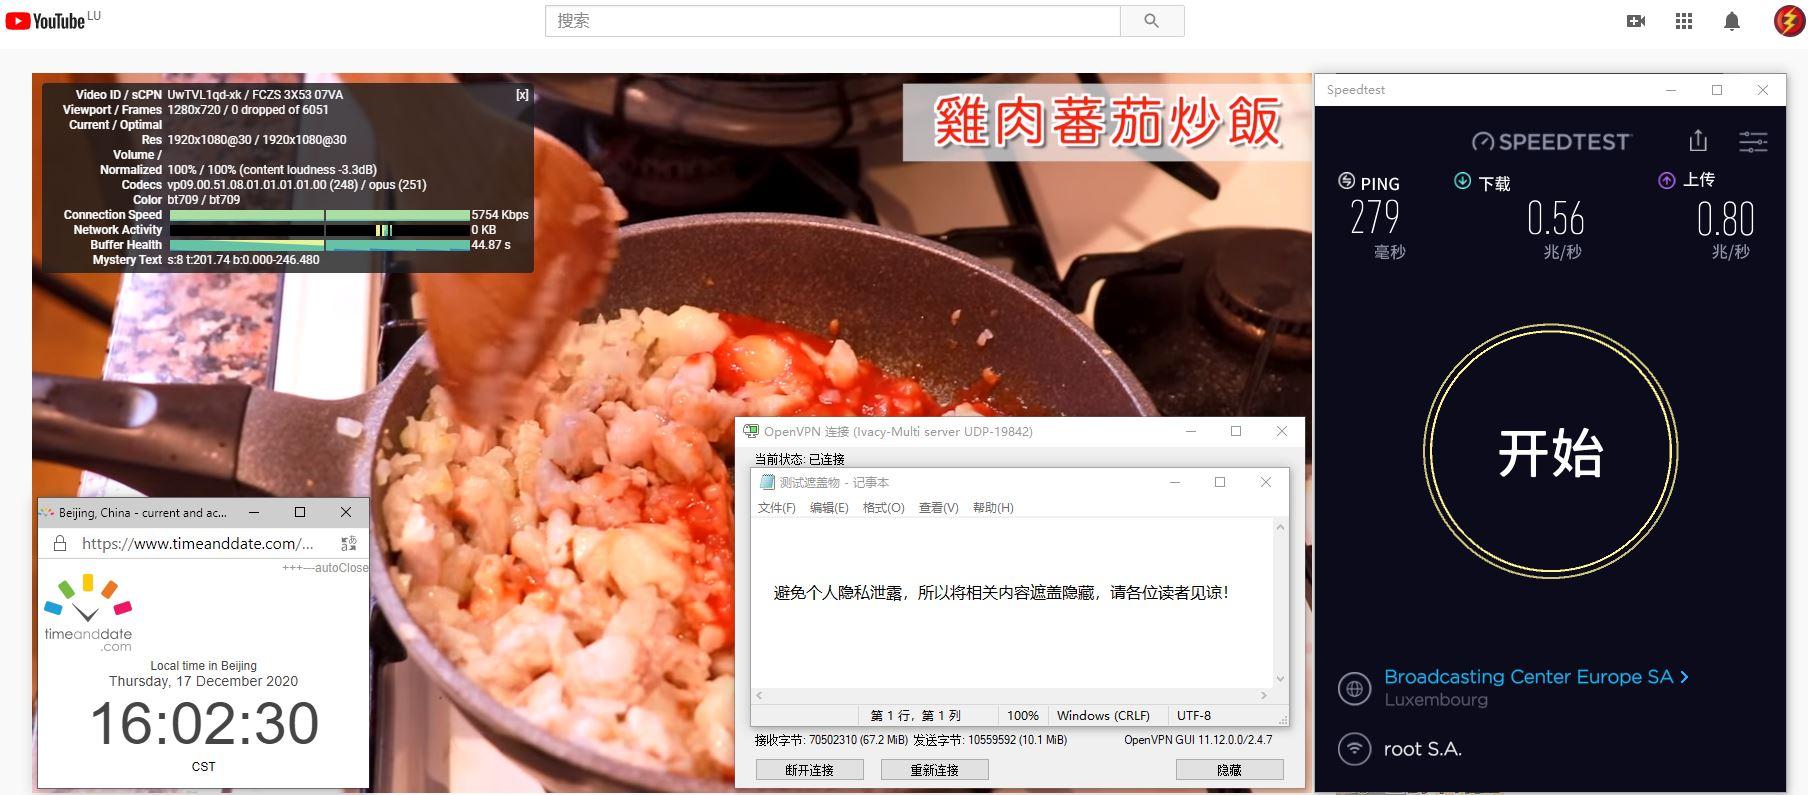 Windows10 IvacyVPN OpenVPN GUI Multi 3 服务器 中国VPN 翻墙 科学上网 测试 - 20201217